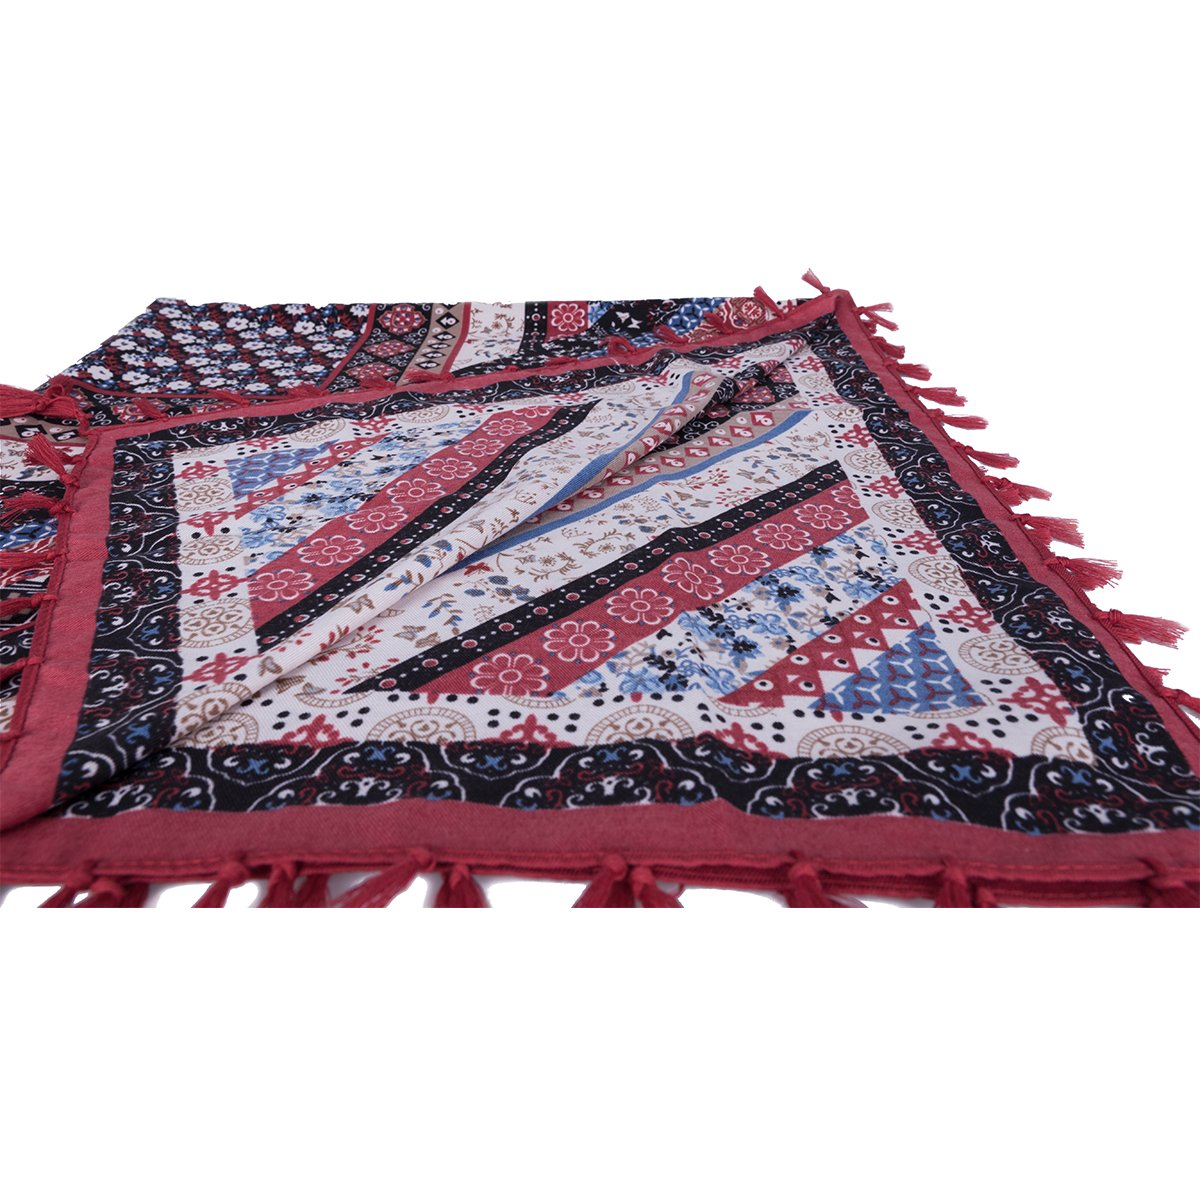 EVRFELAN Women Boho Scarf Tassel Shawl Tapestry Tablecloth Beach Towel Picnic Throw Wall Hanging Yoga Mat Ladies Cotton Scarves by Popular Handicrafts (Red1)